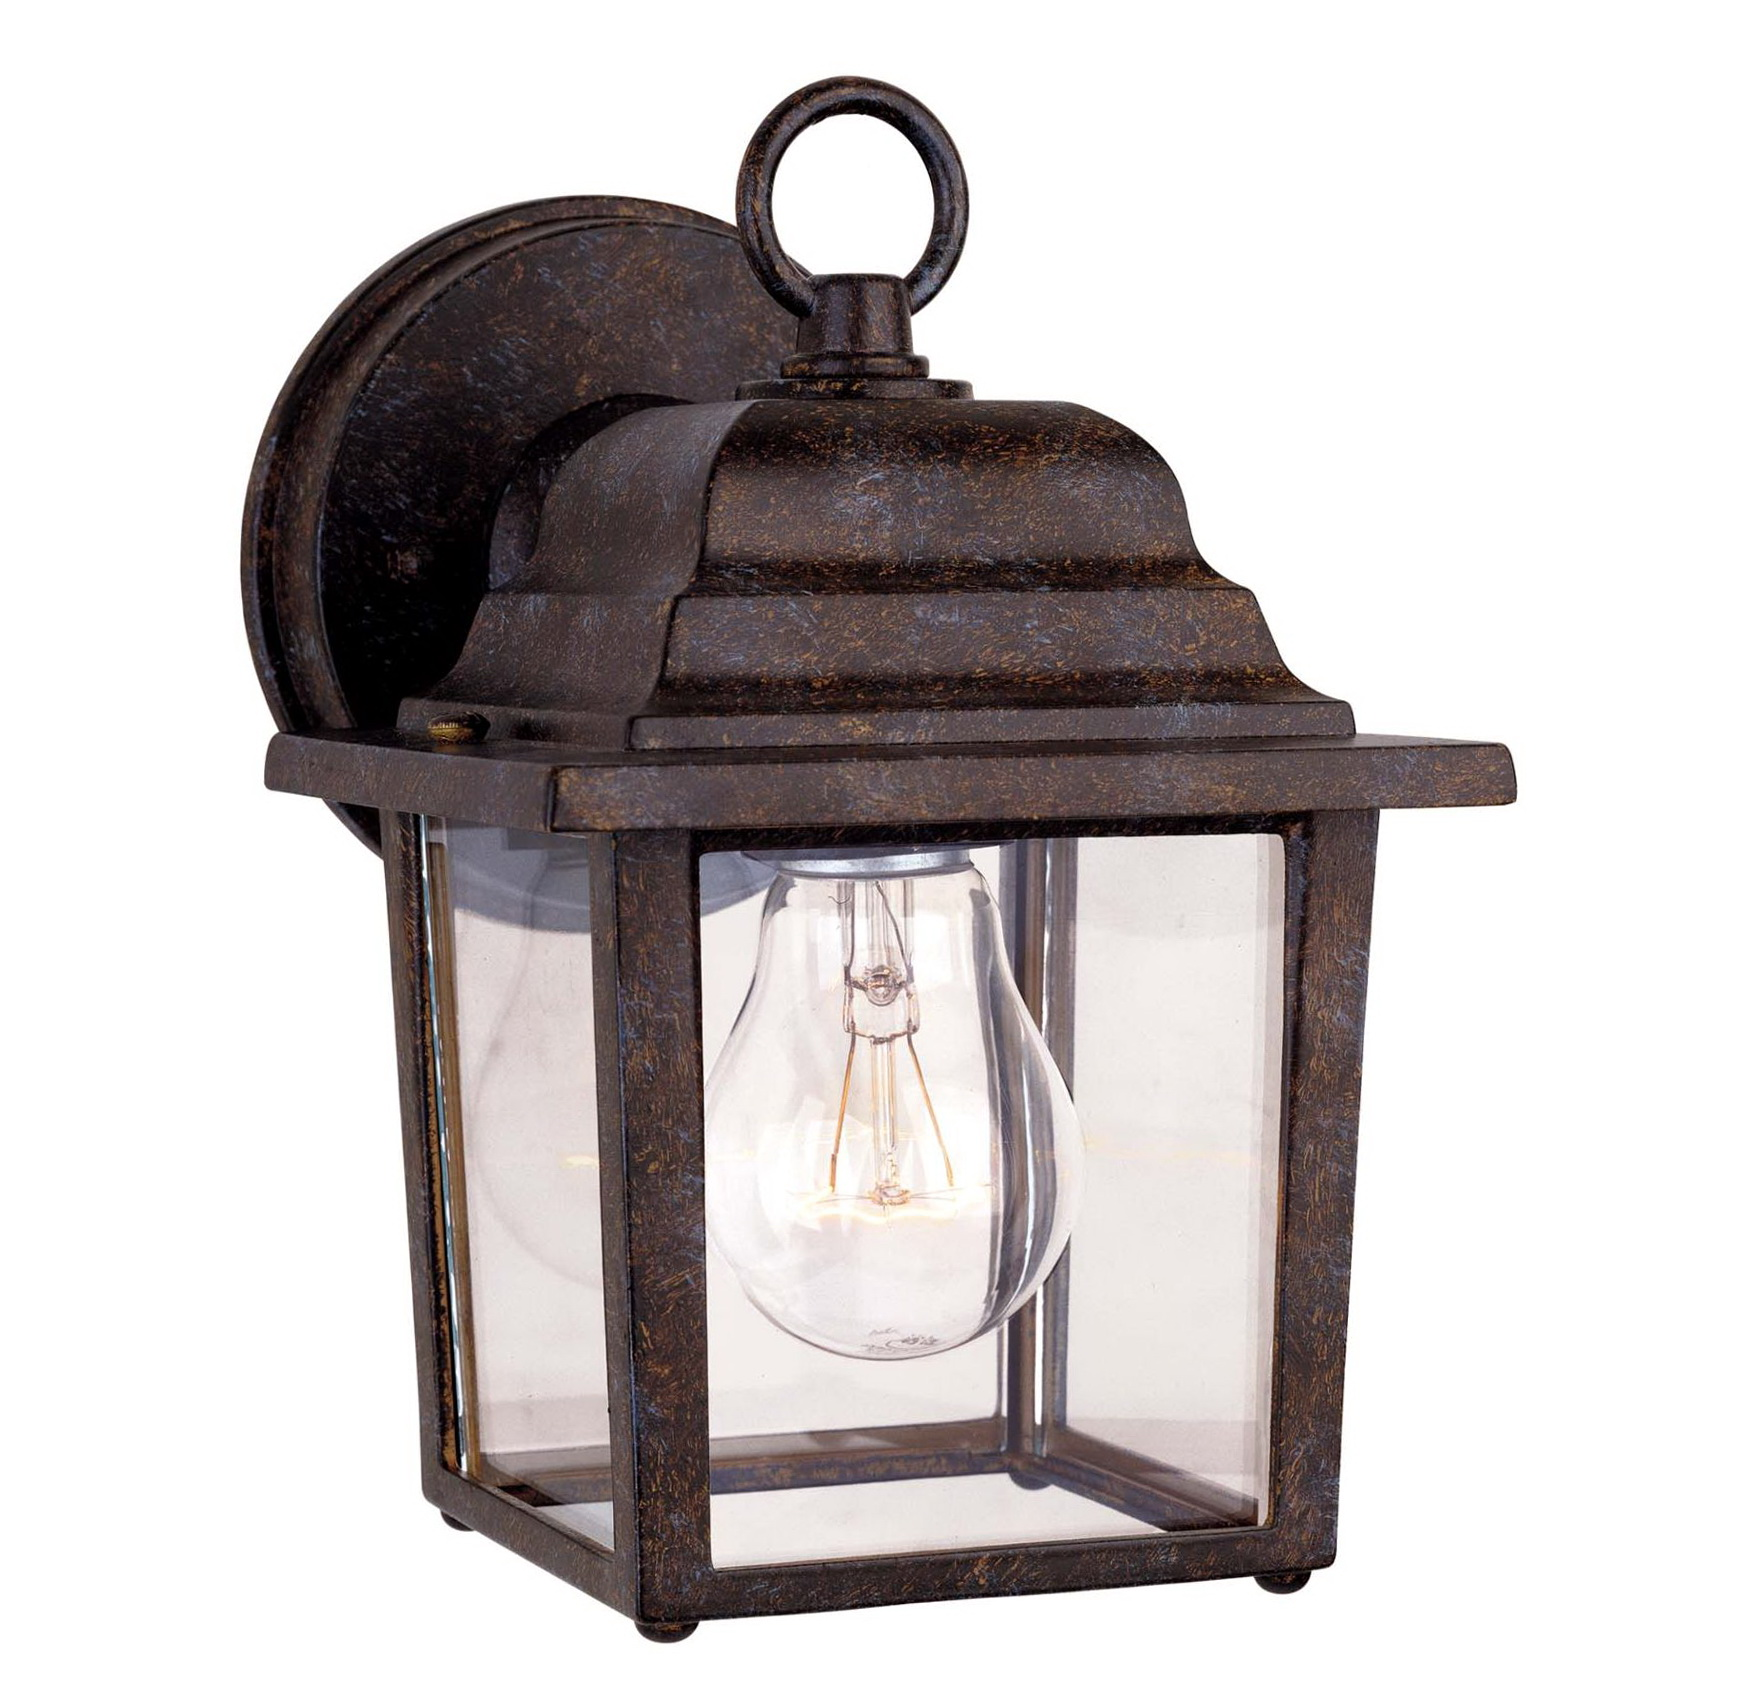 Permalink to Sconce Lighting Fixtures Home Depot